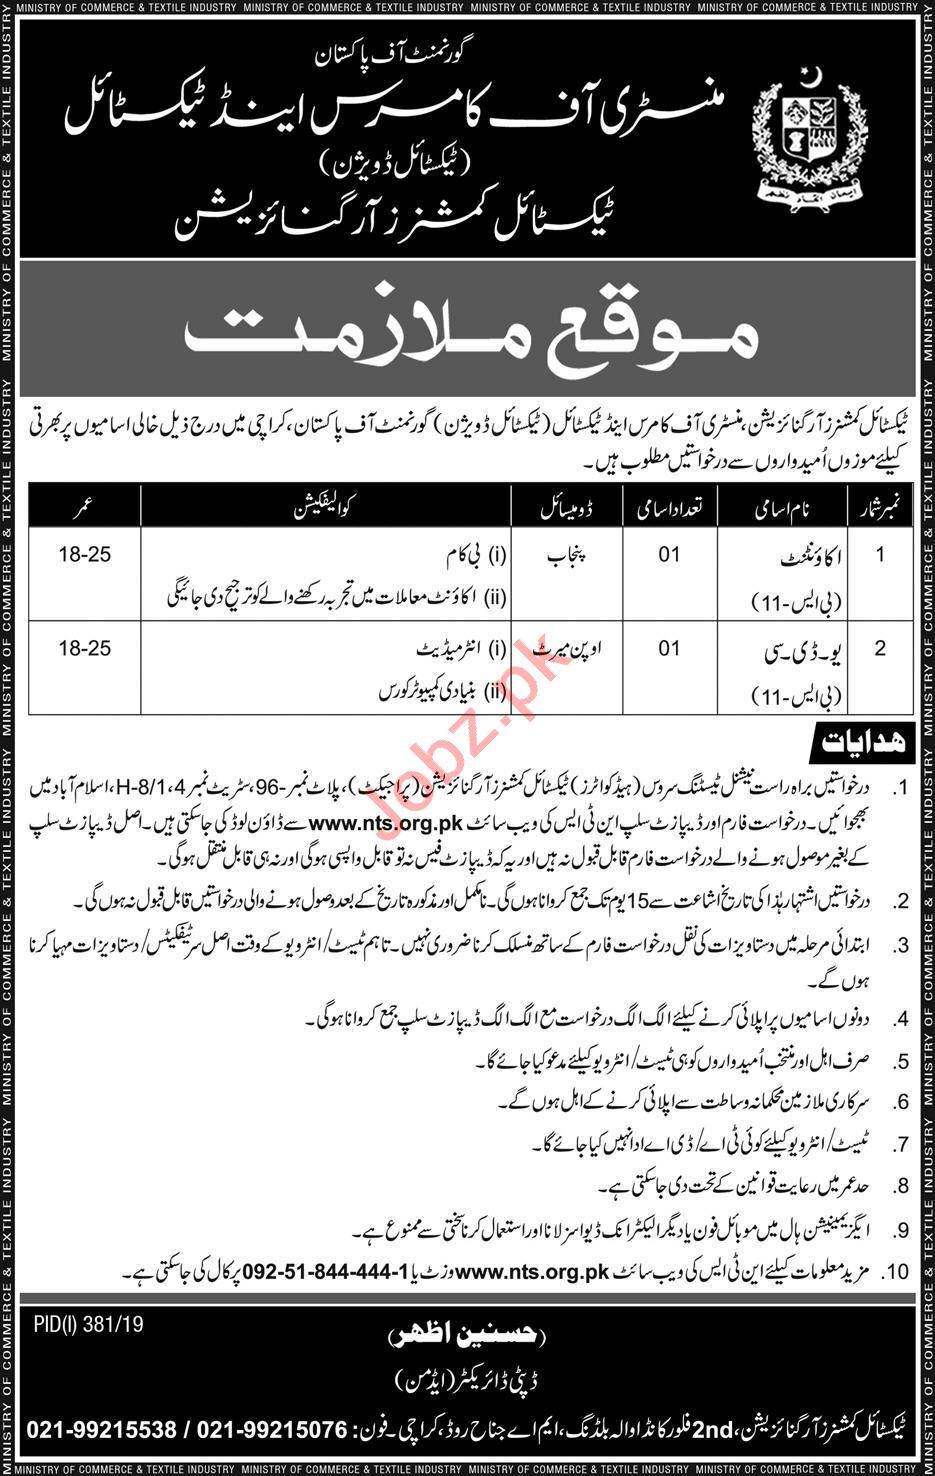 Ministry of Commerce & Textile Jobs in Karachi via NTS